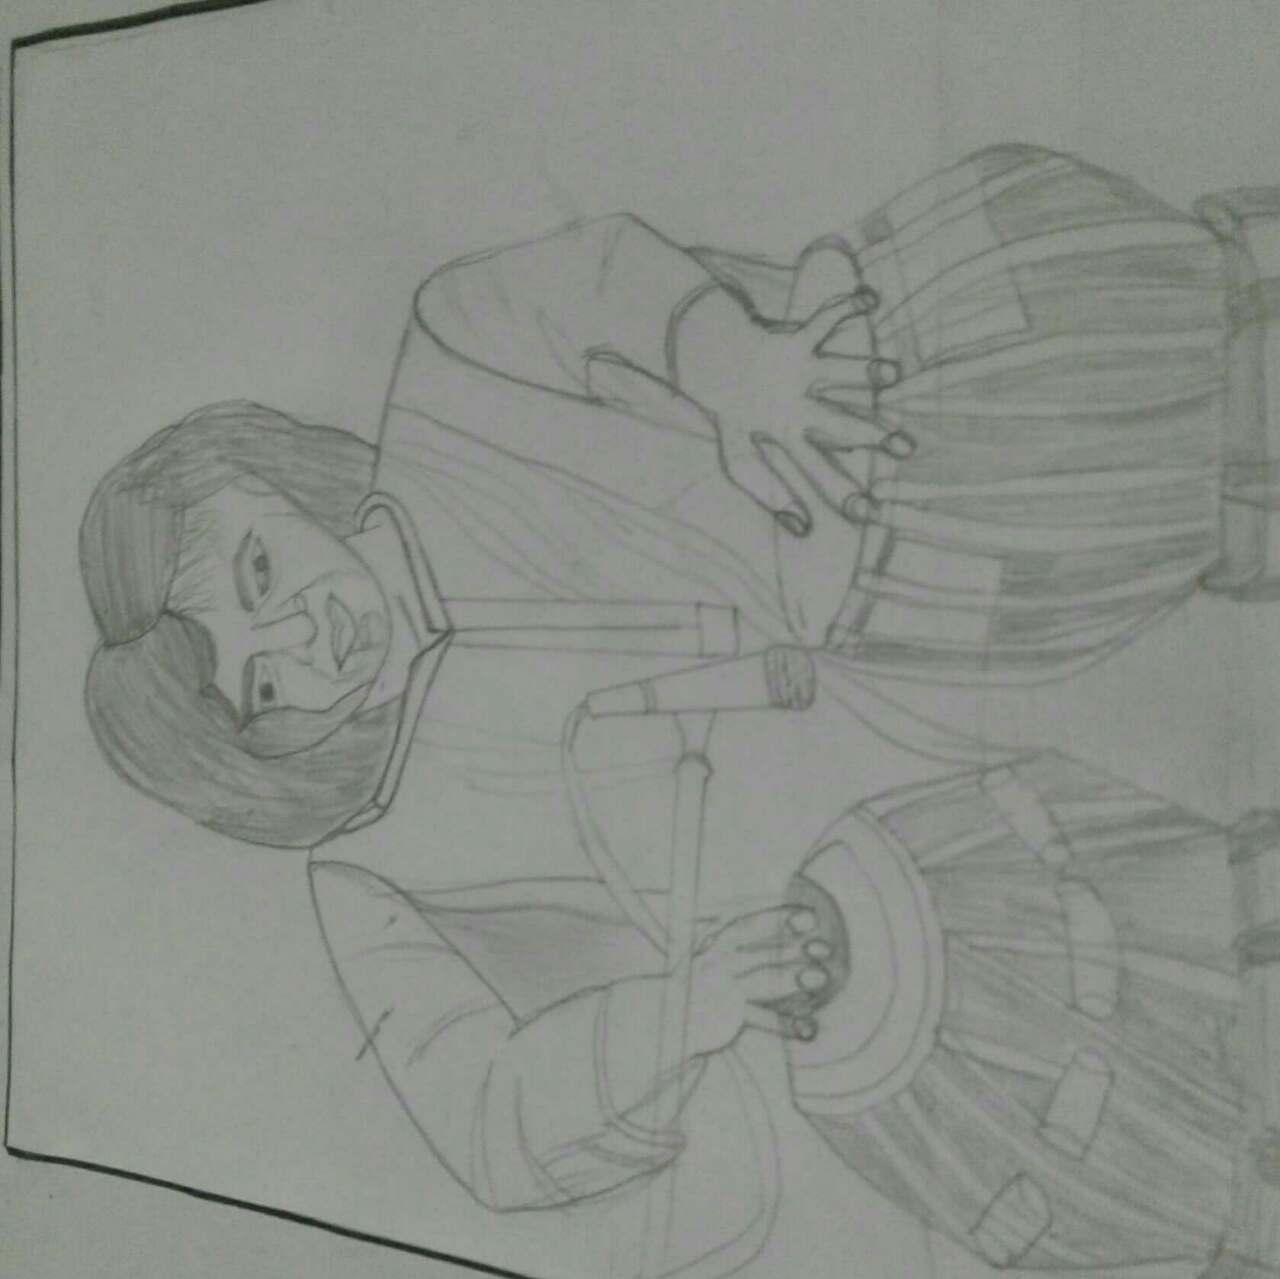 Nojoto art nojoto art pencil sketch dra english nojoto